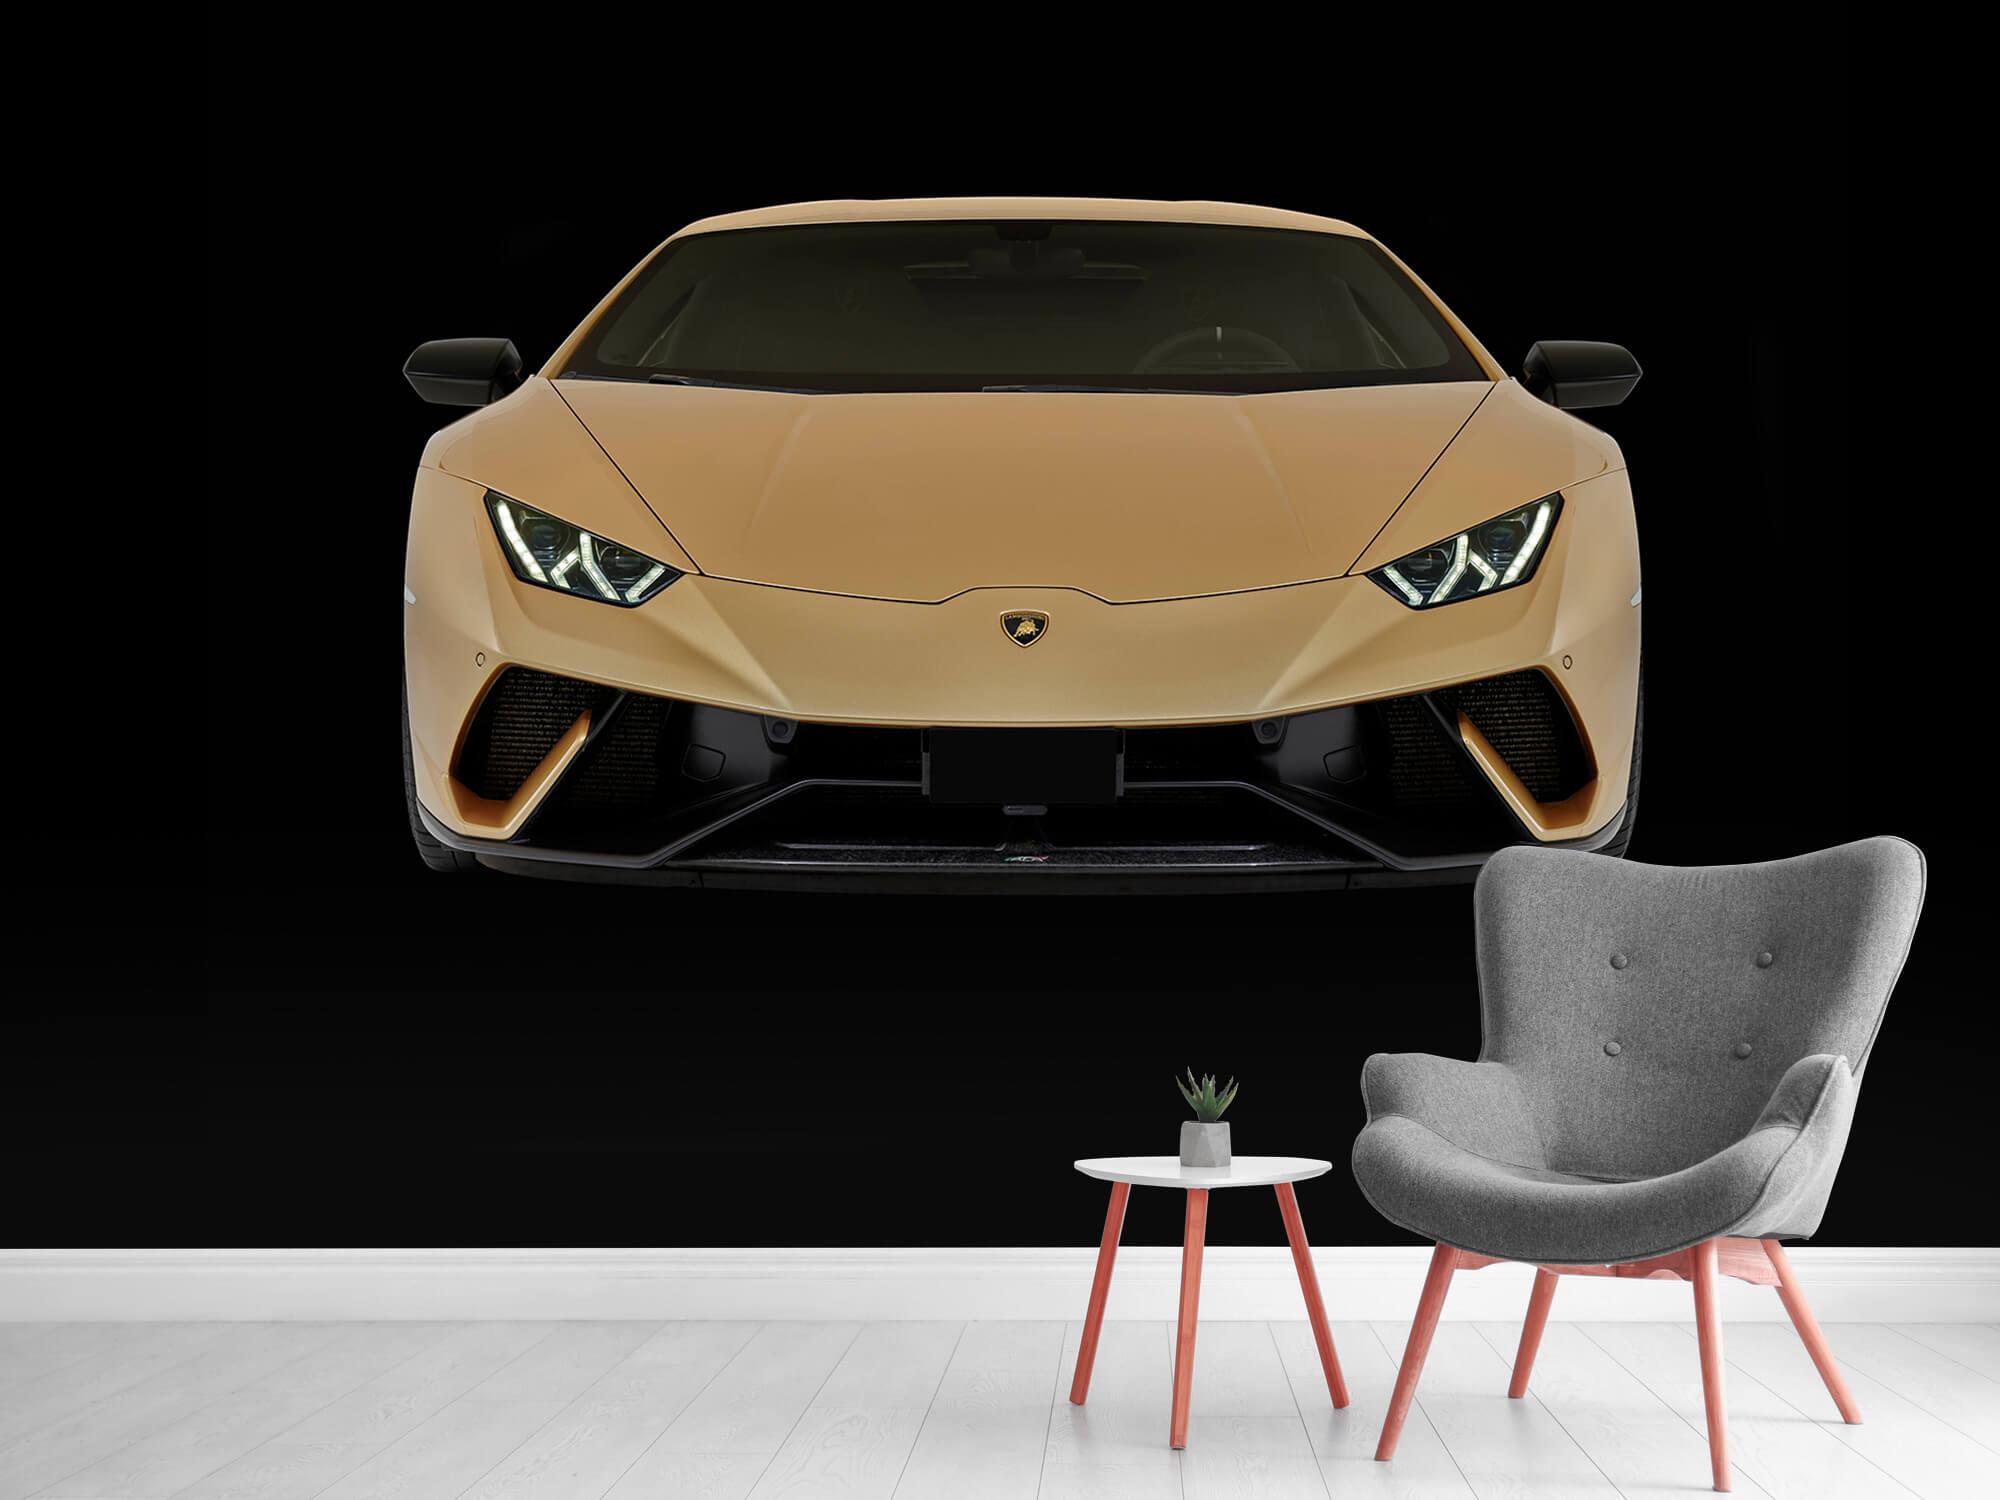 Wallpaper Lamborghini Huracán - Voorkant, zwart 12